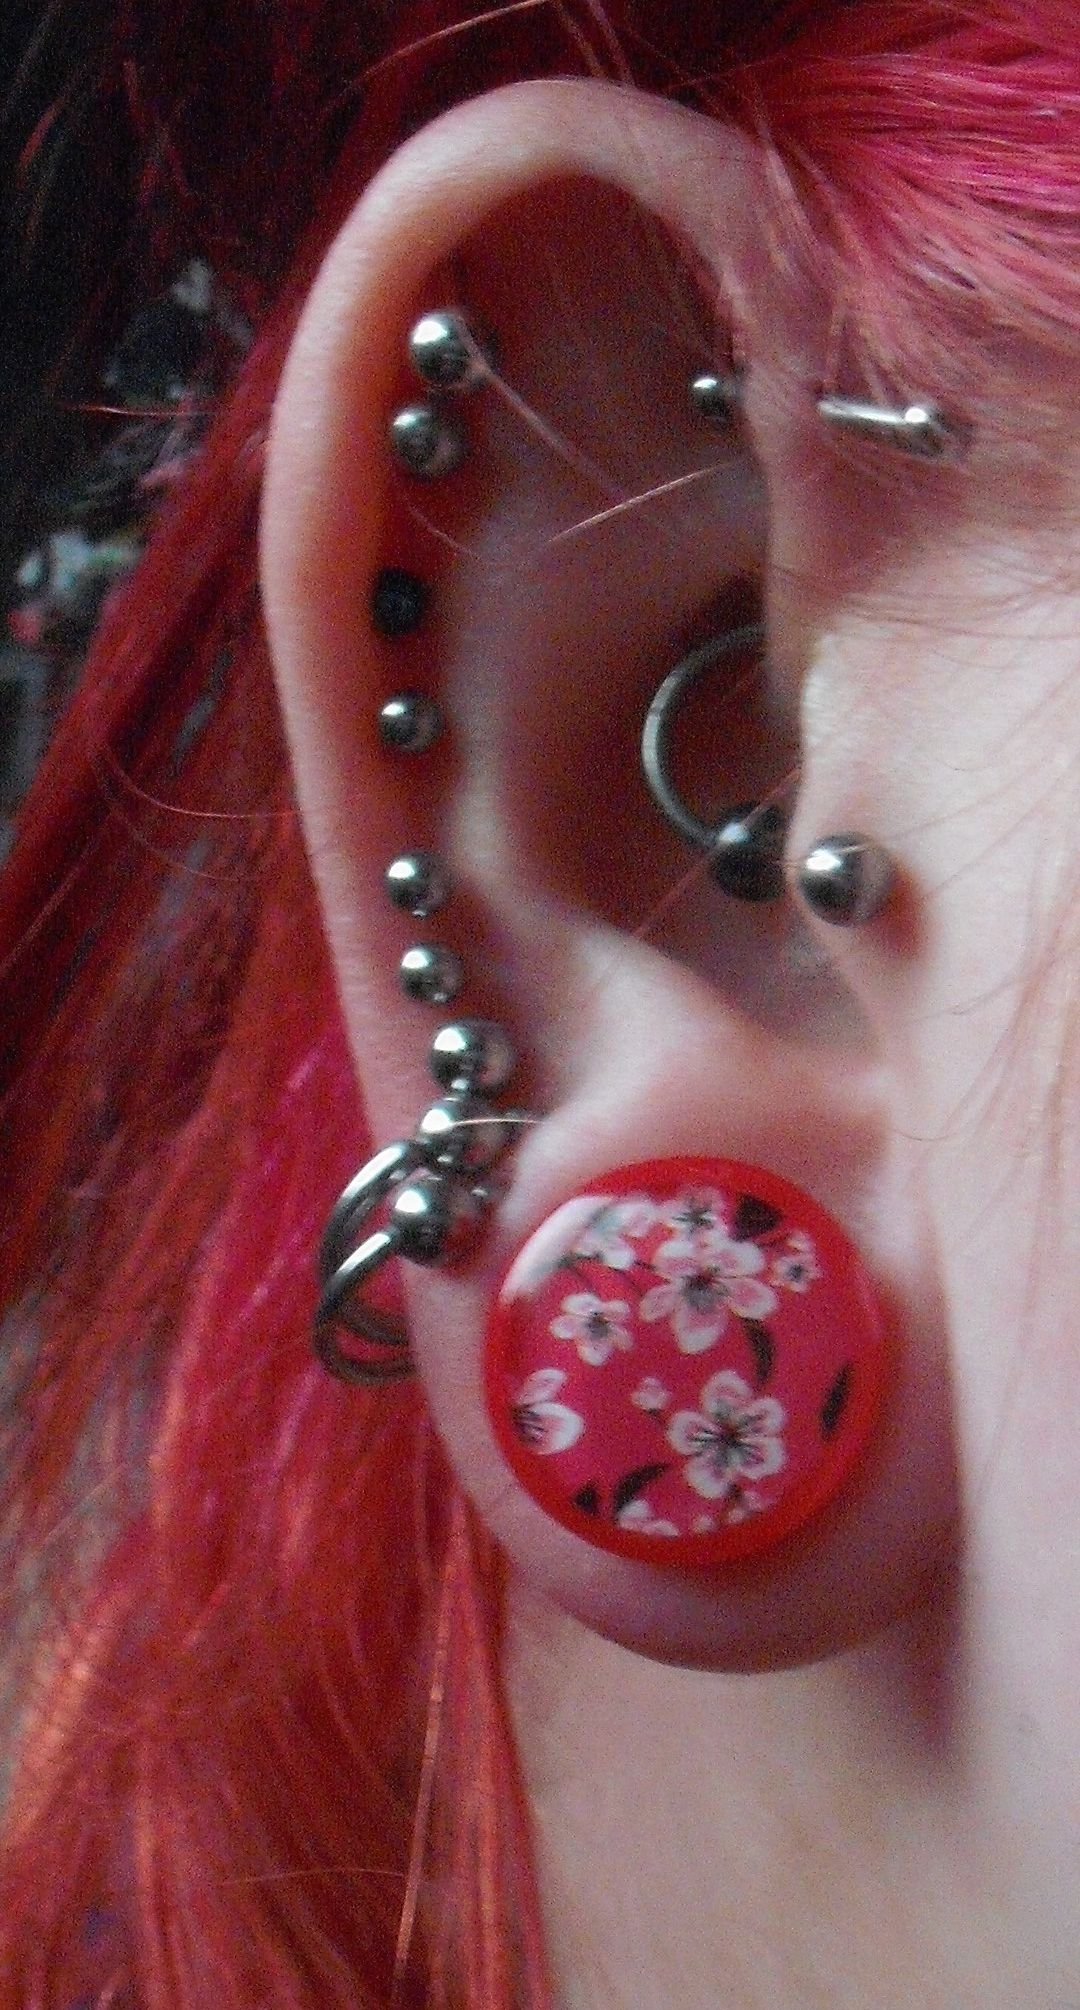 Above nose piercing  mm lobe and new mm antihelix  Piercings  Pinterest  Piercings